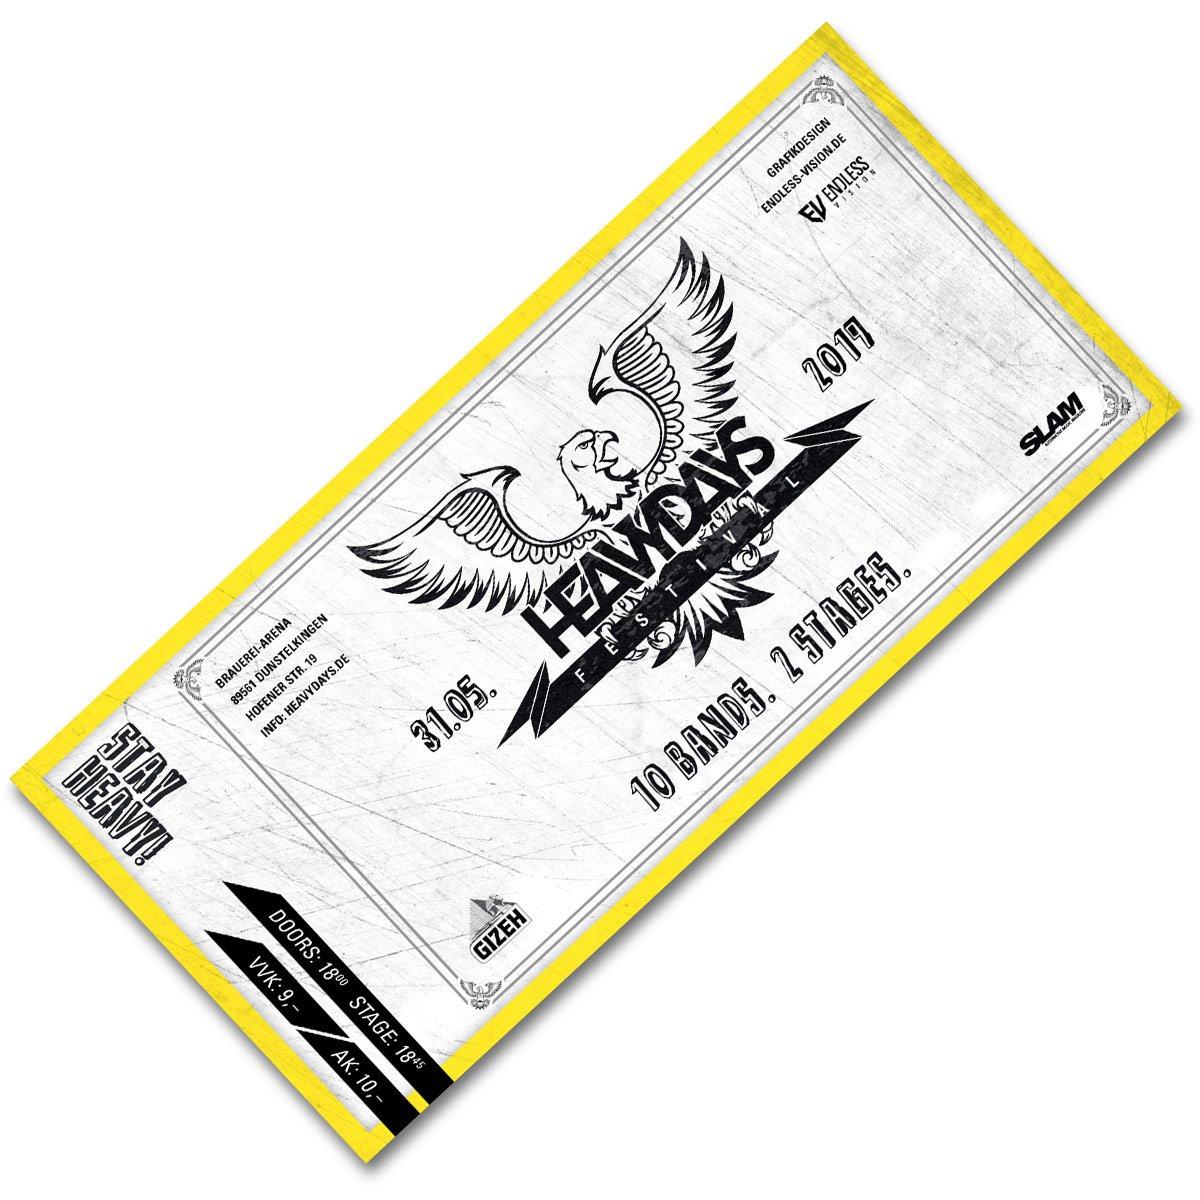 Image of Heavydays 2019 Ticket - Print@Home